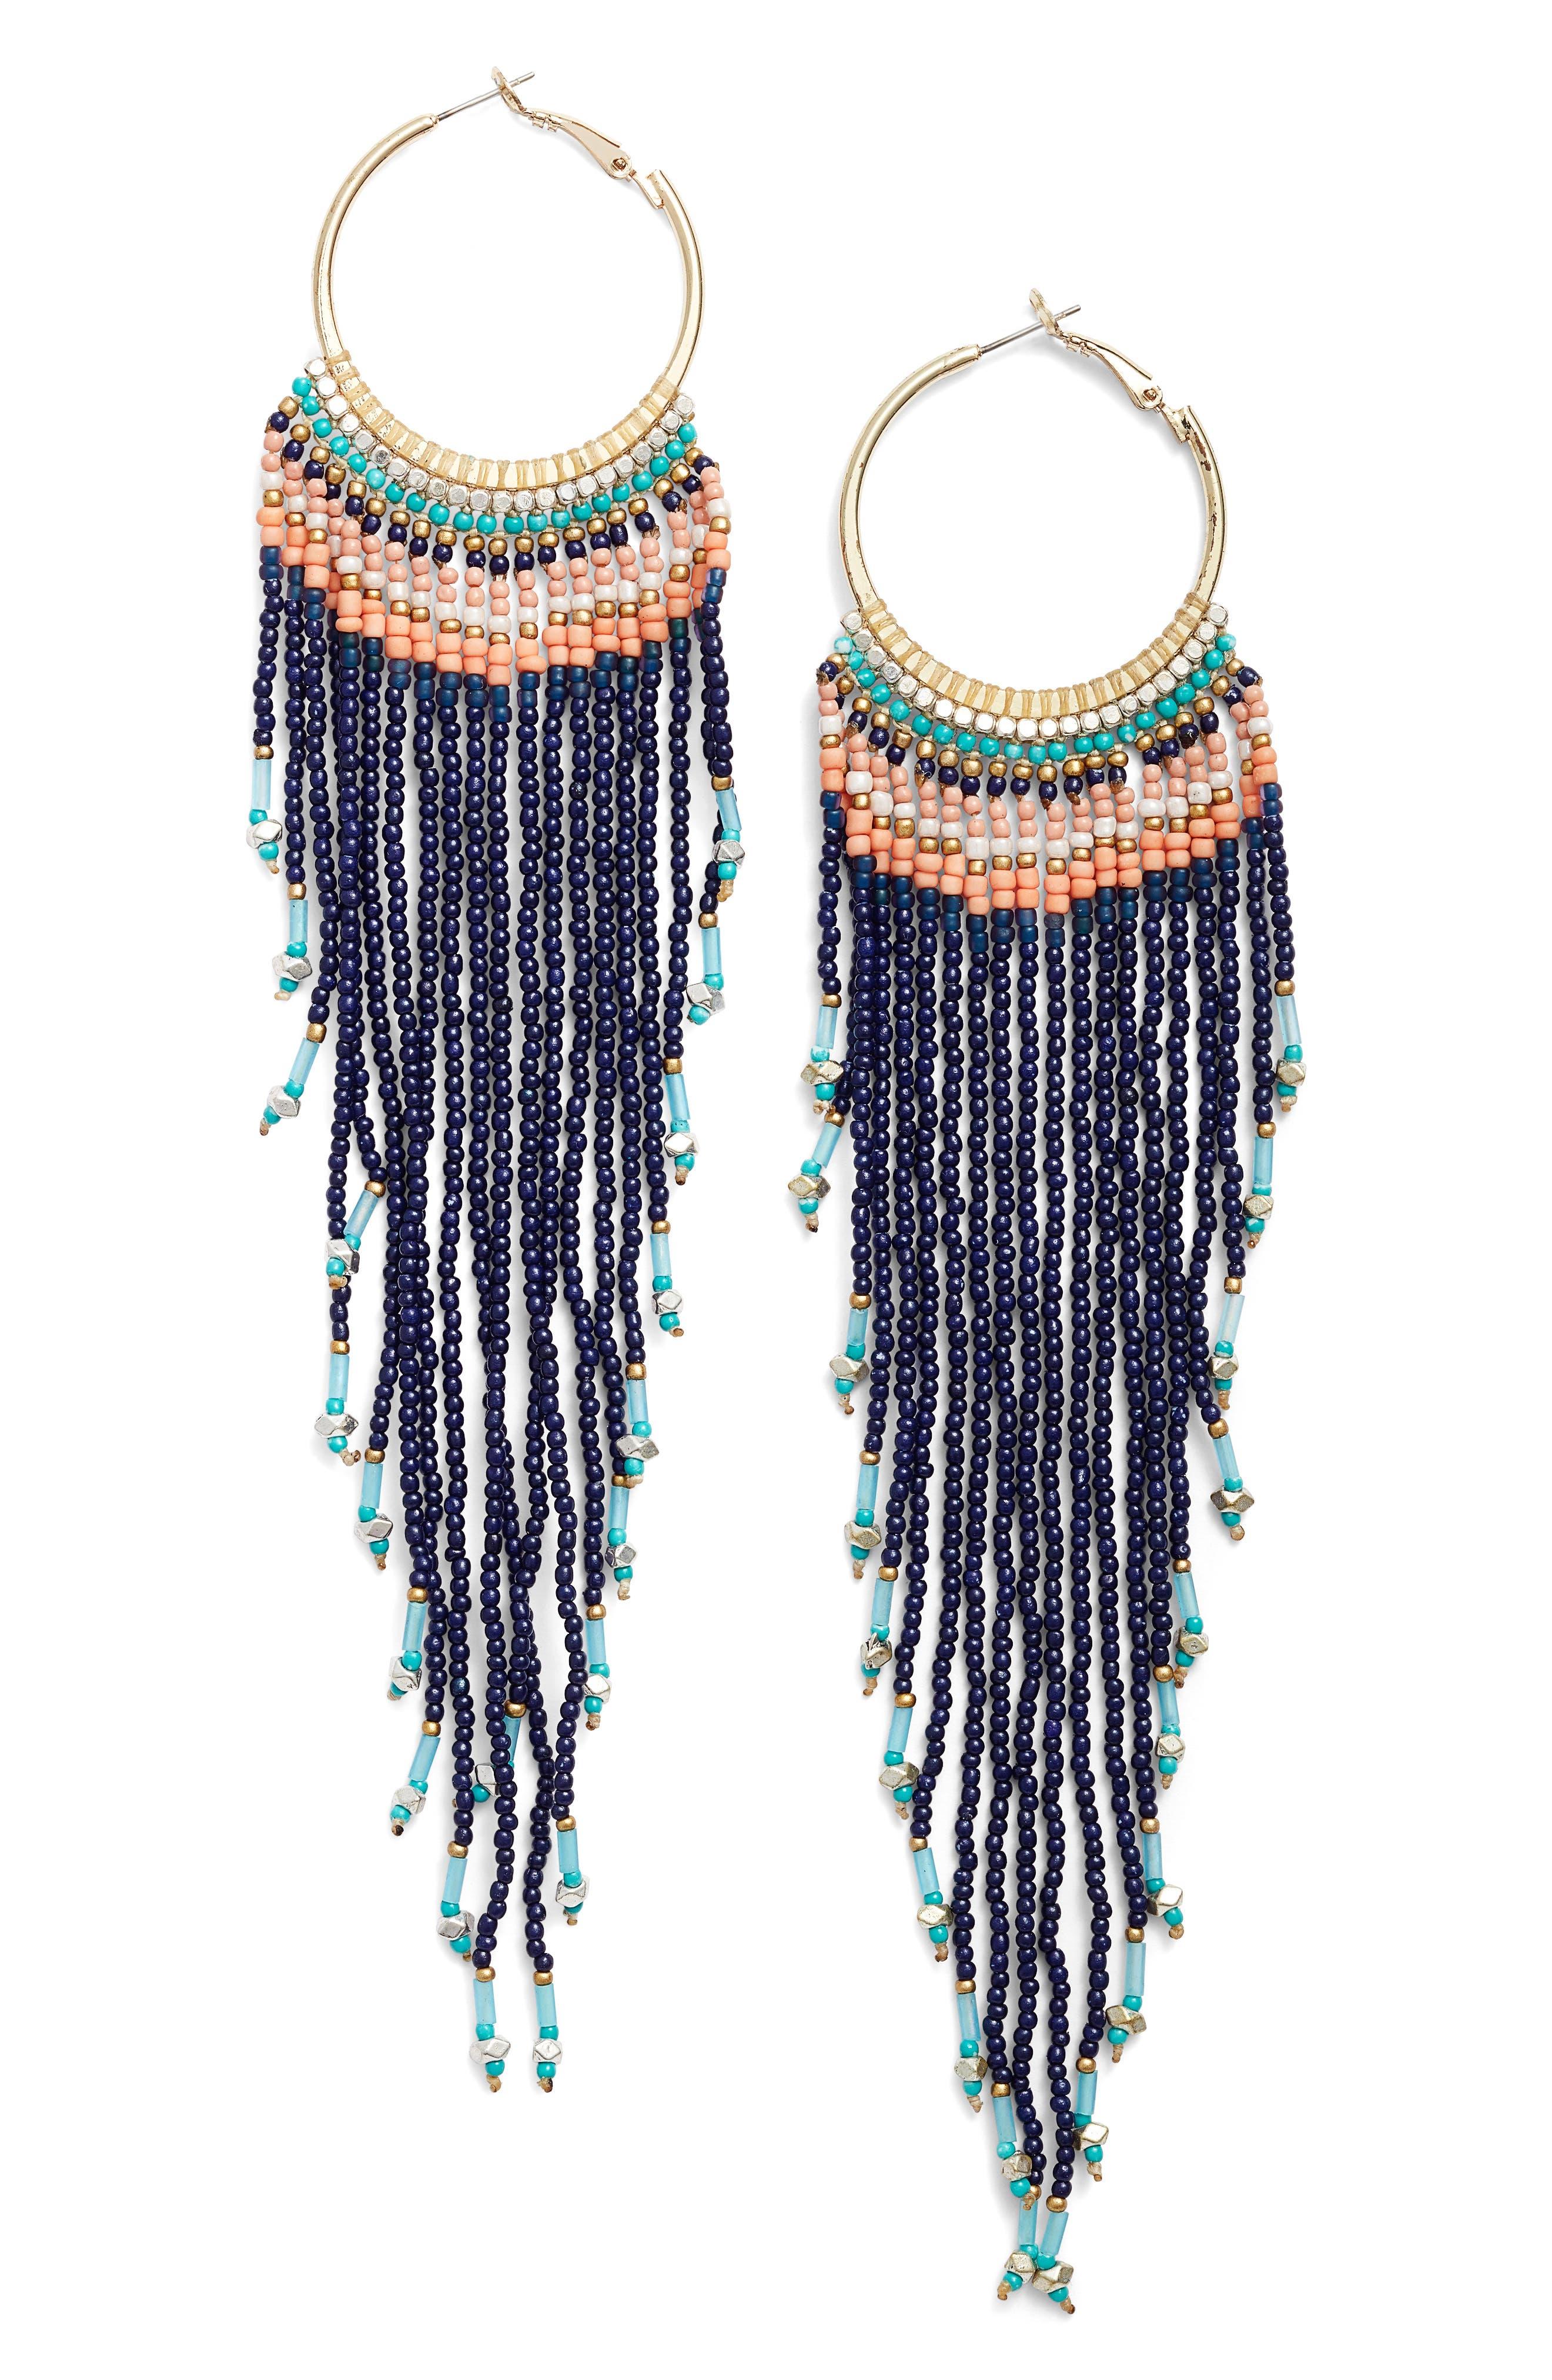 Alternate Image 1 Selected - Nakamol Design Aban Beaded Tassel Hoop Earrings